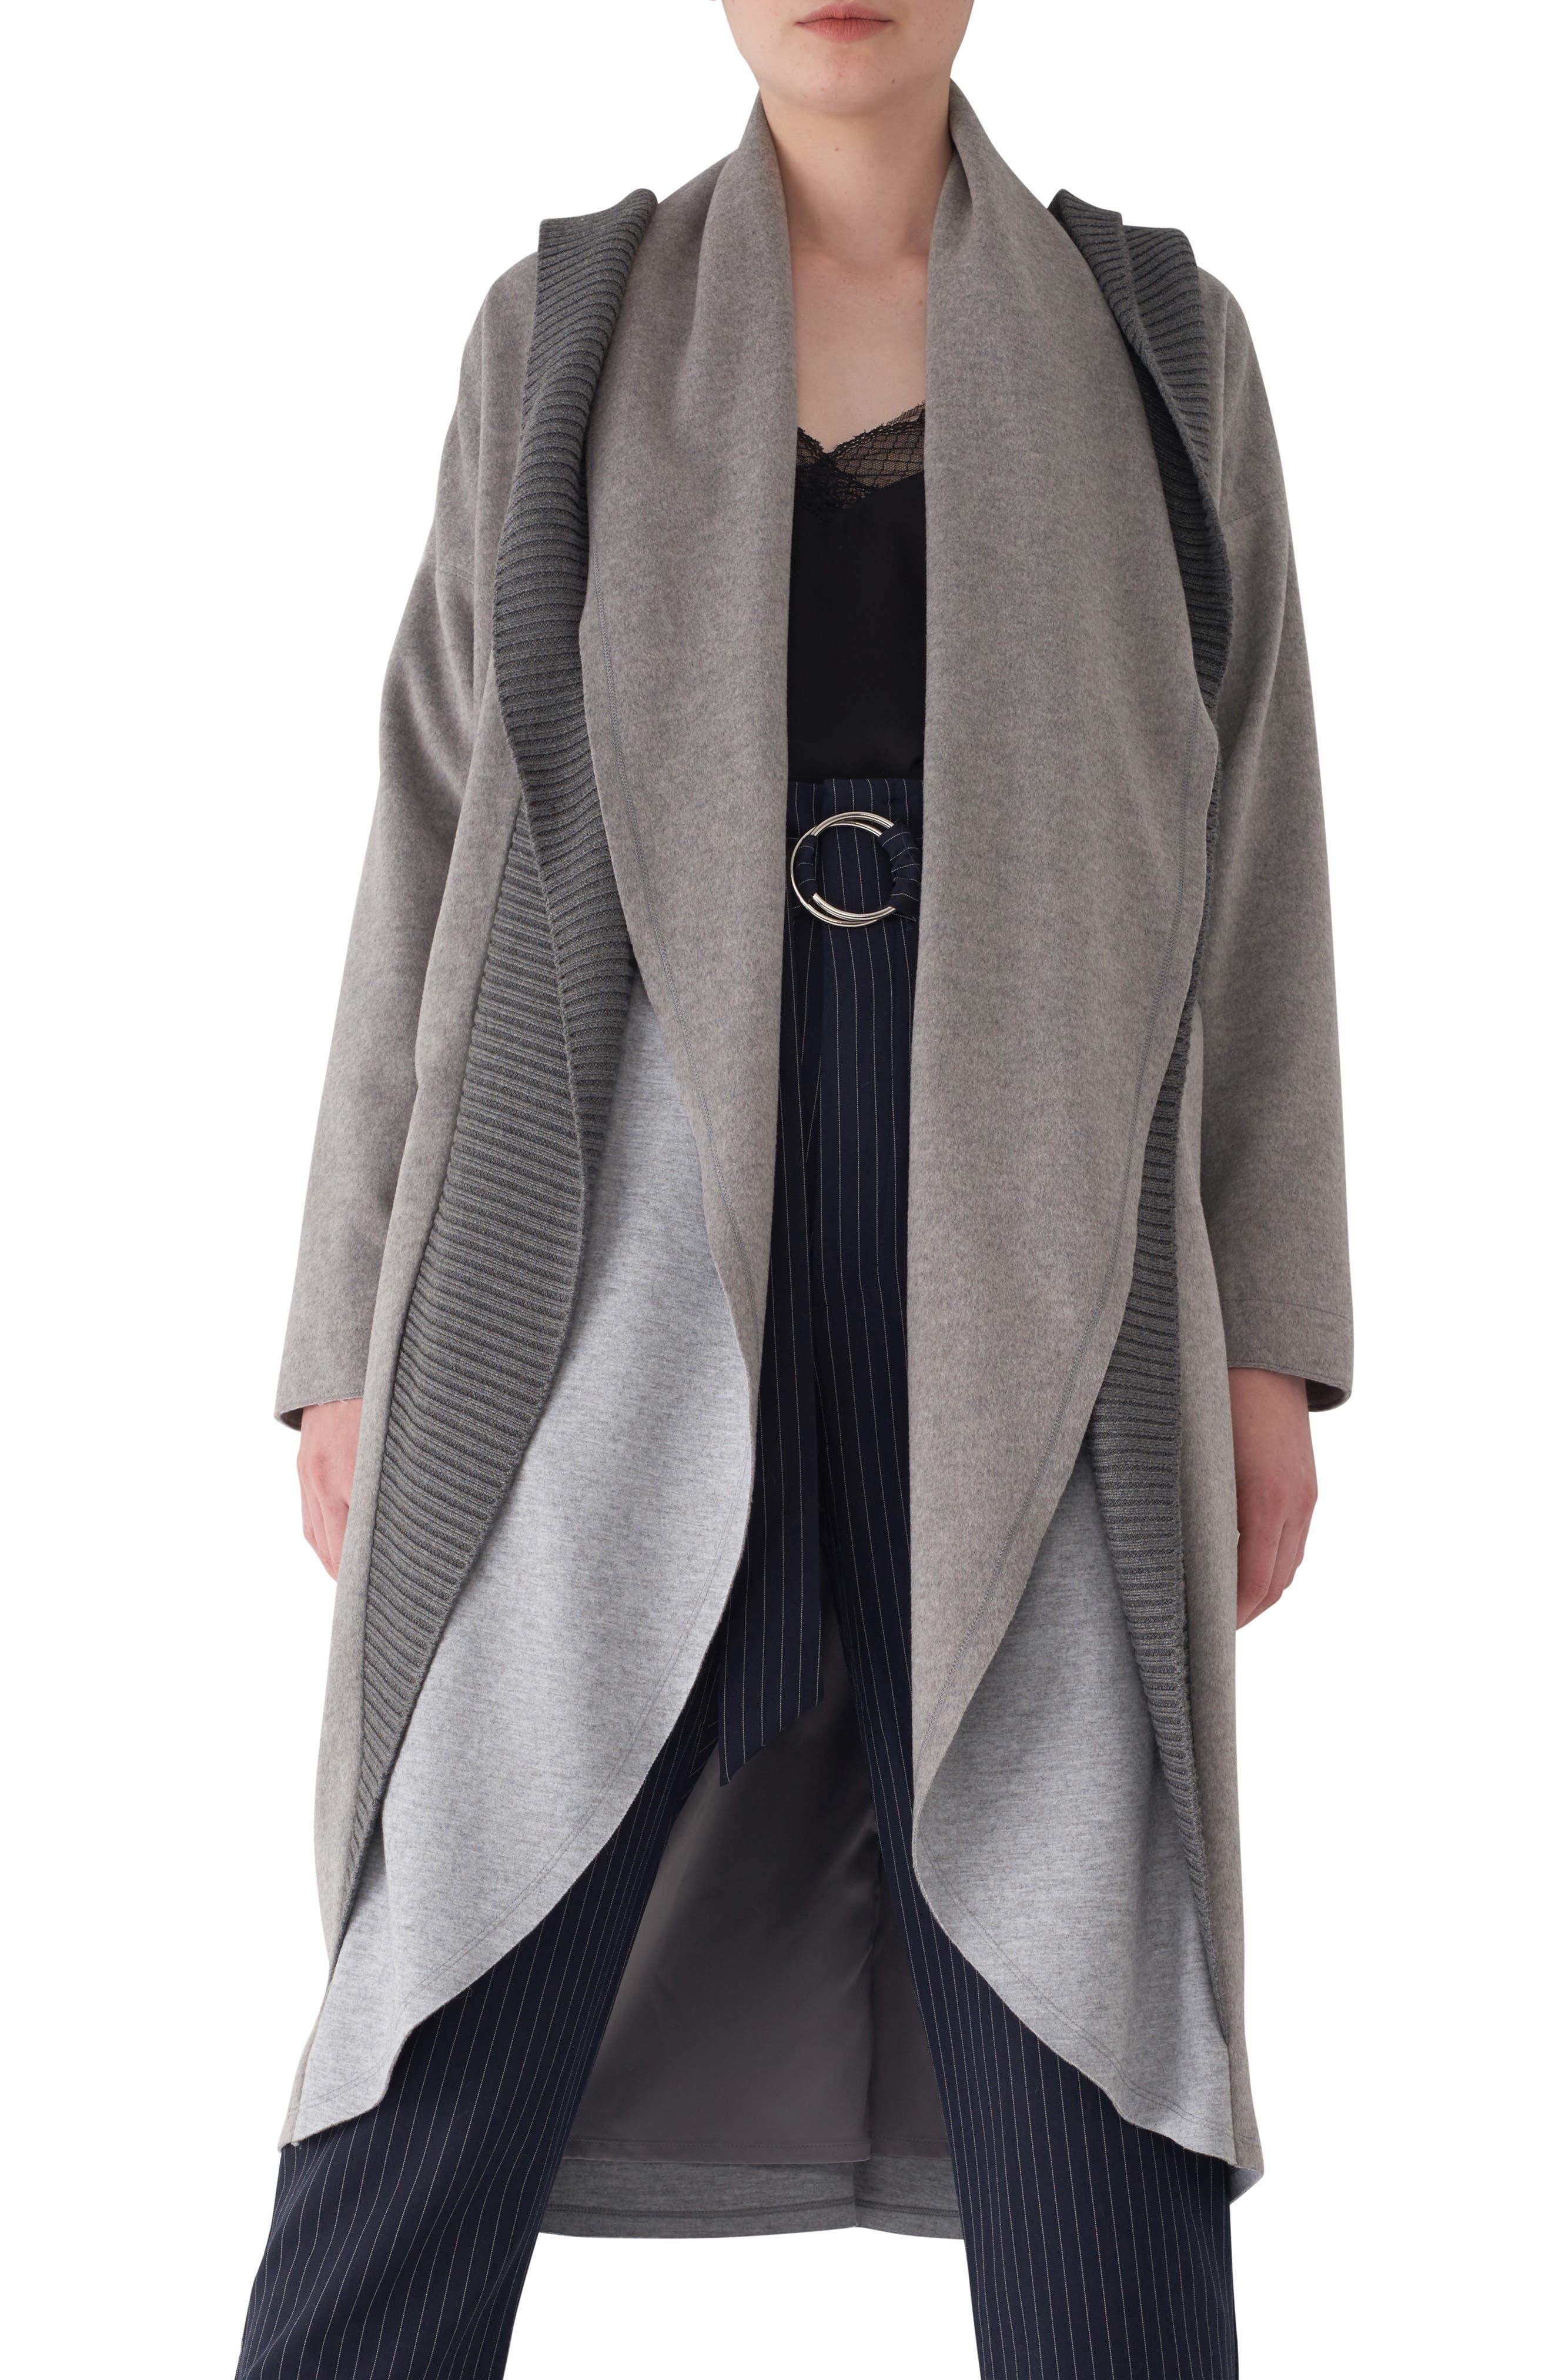 Brandy Stone Grey Duster Coat,                         Main,                         color, GREY